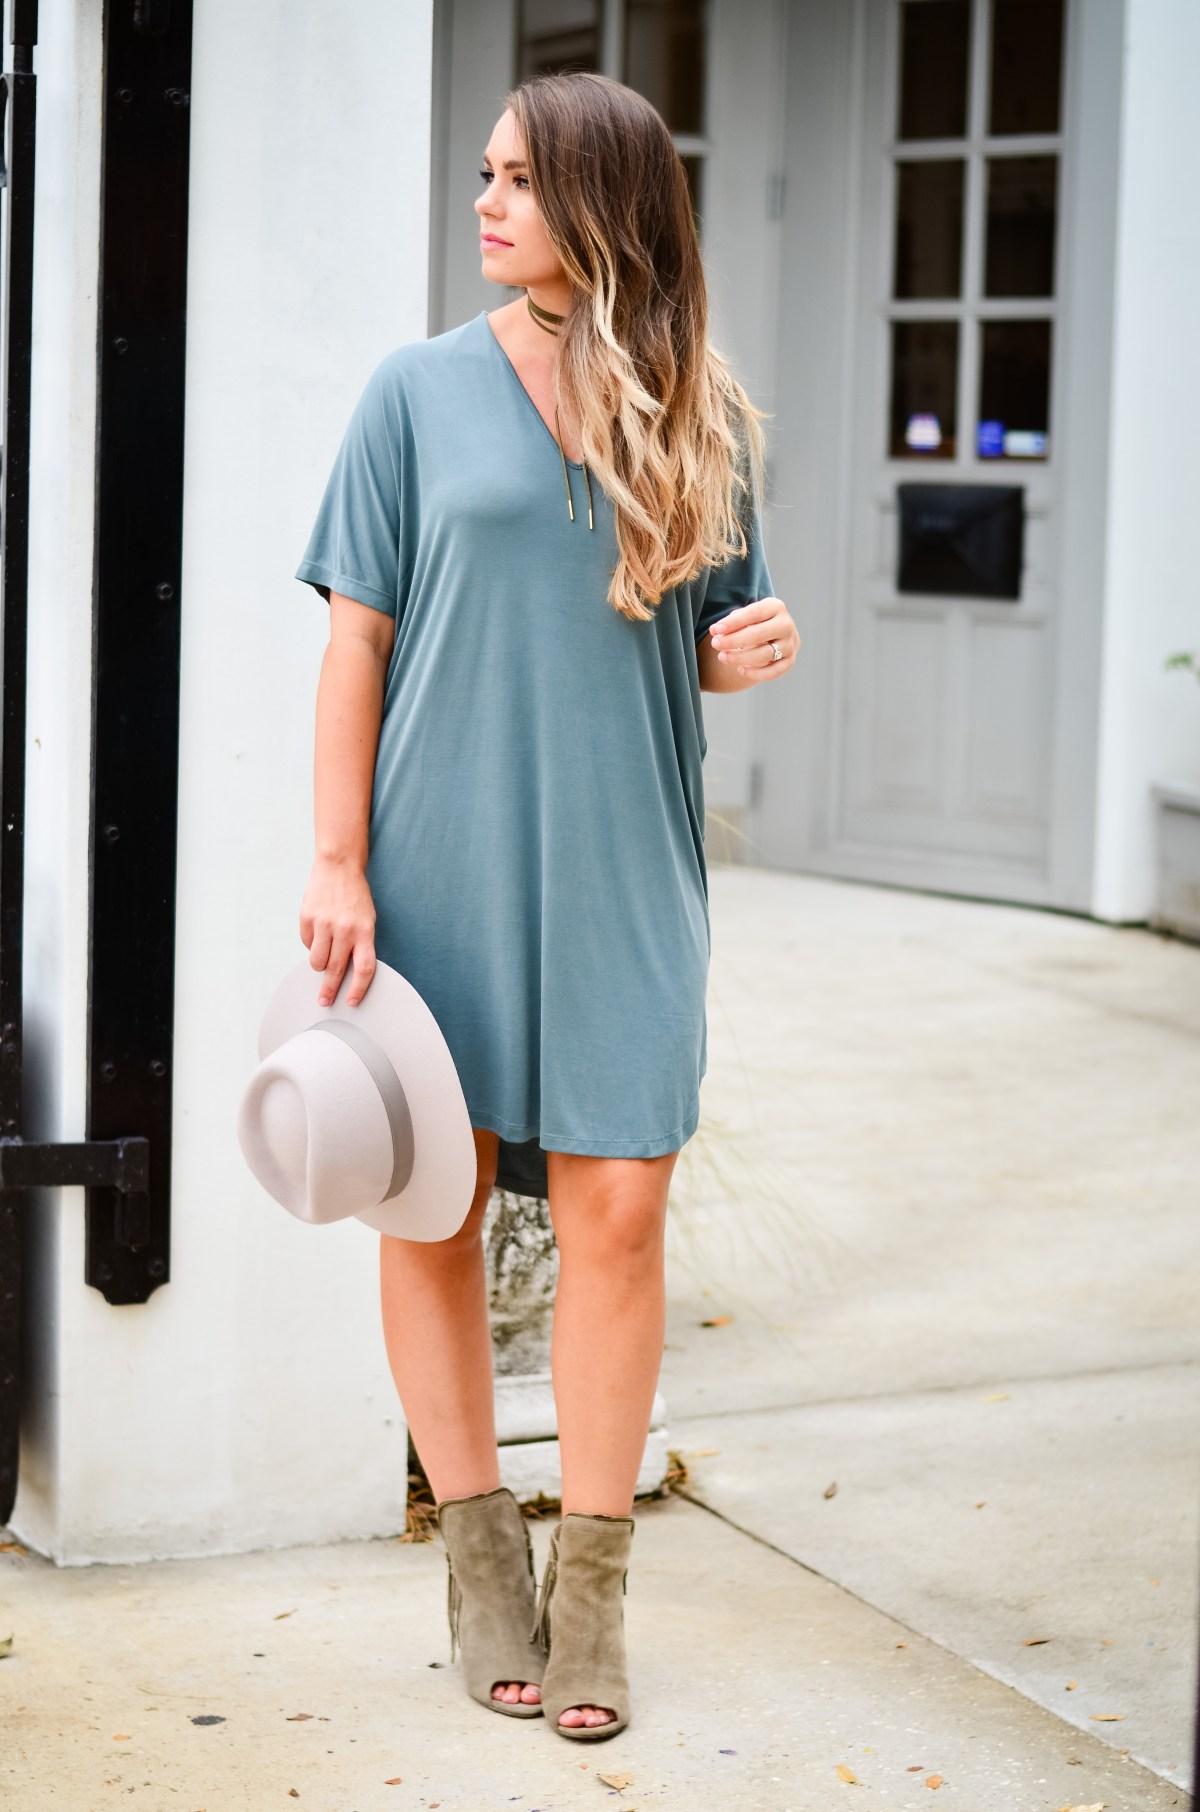 light-teal-dress-hat-booties-goldfinch-21